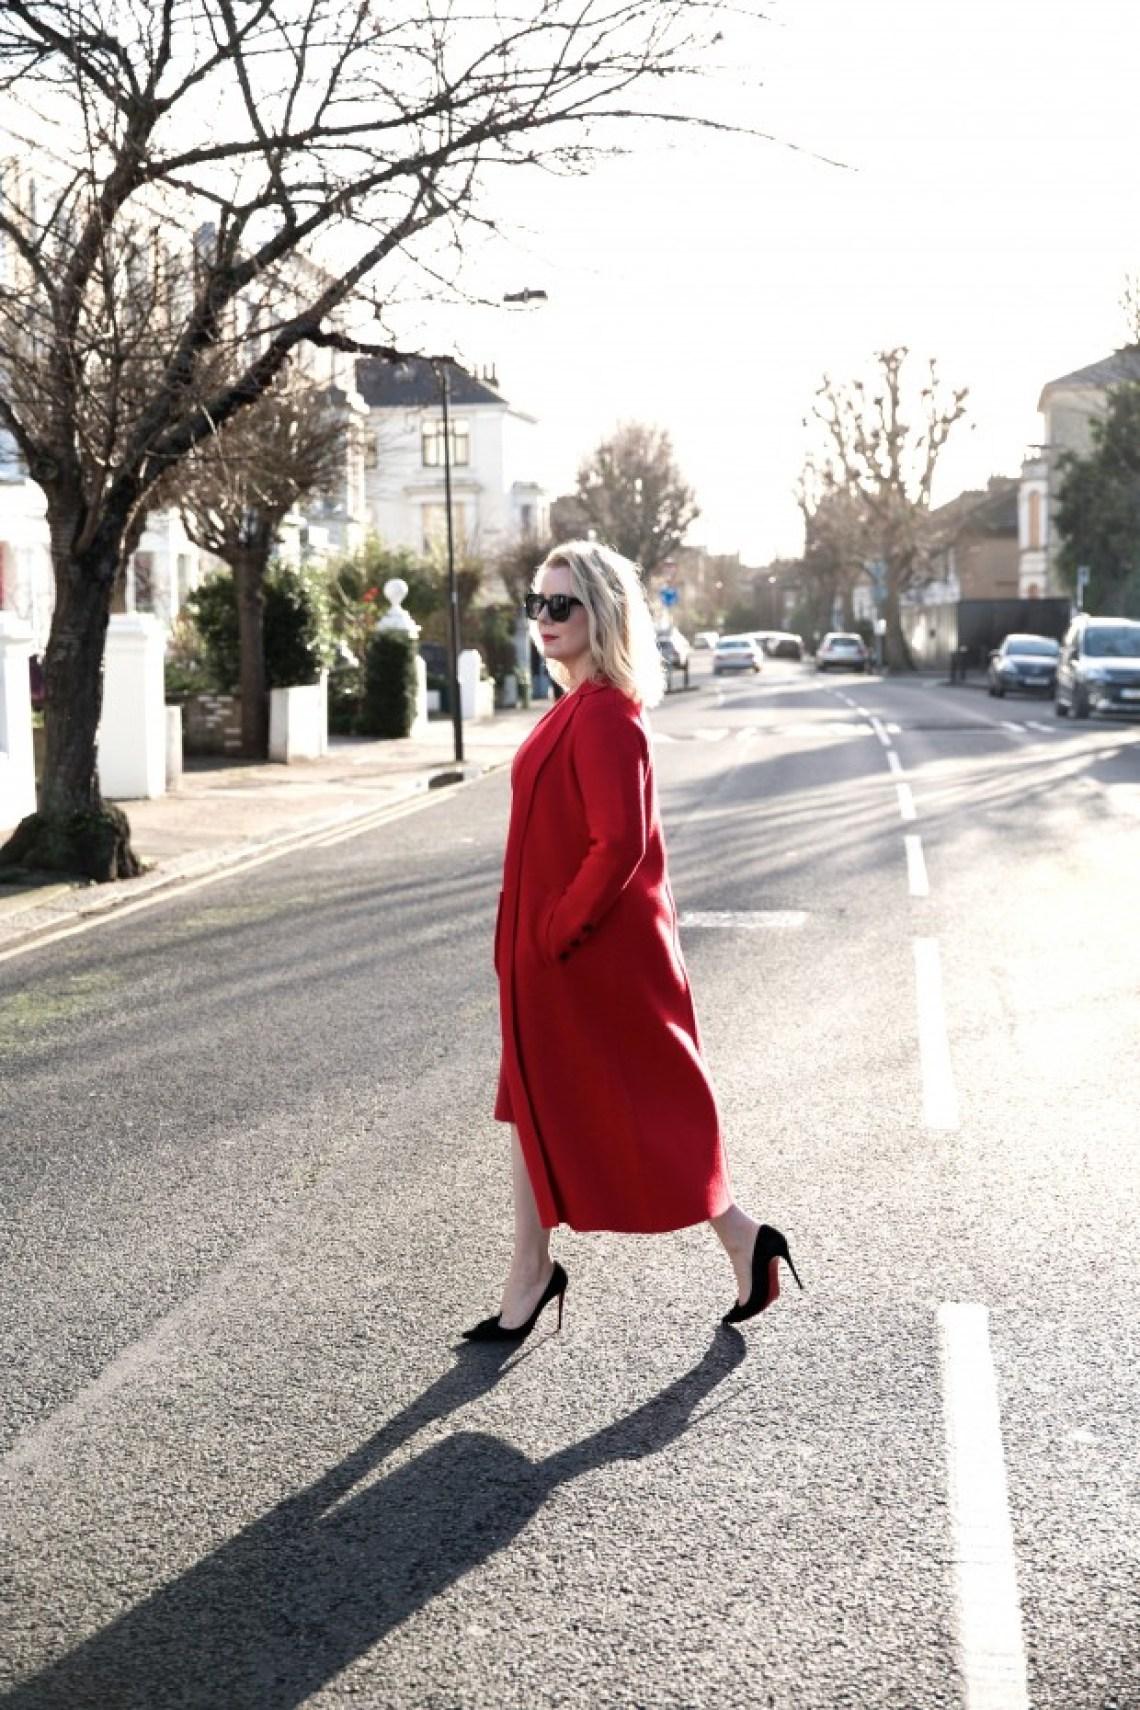 Blonde in red coat